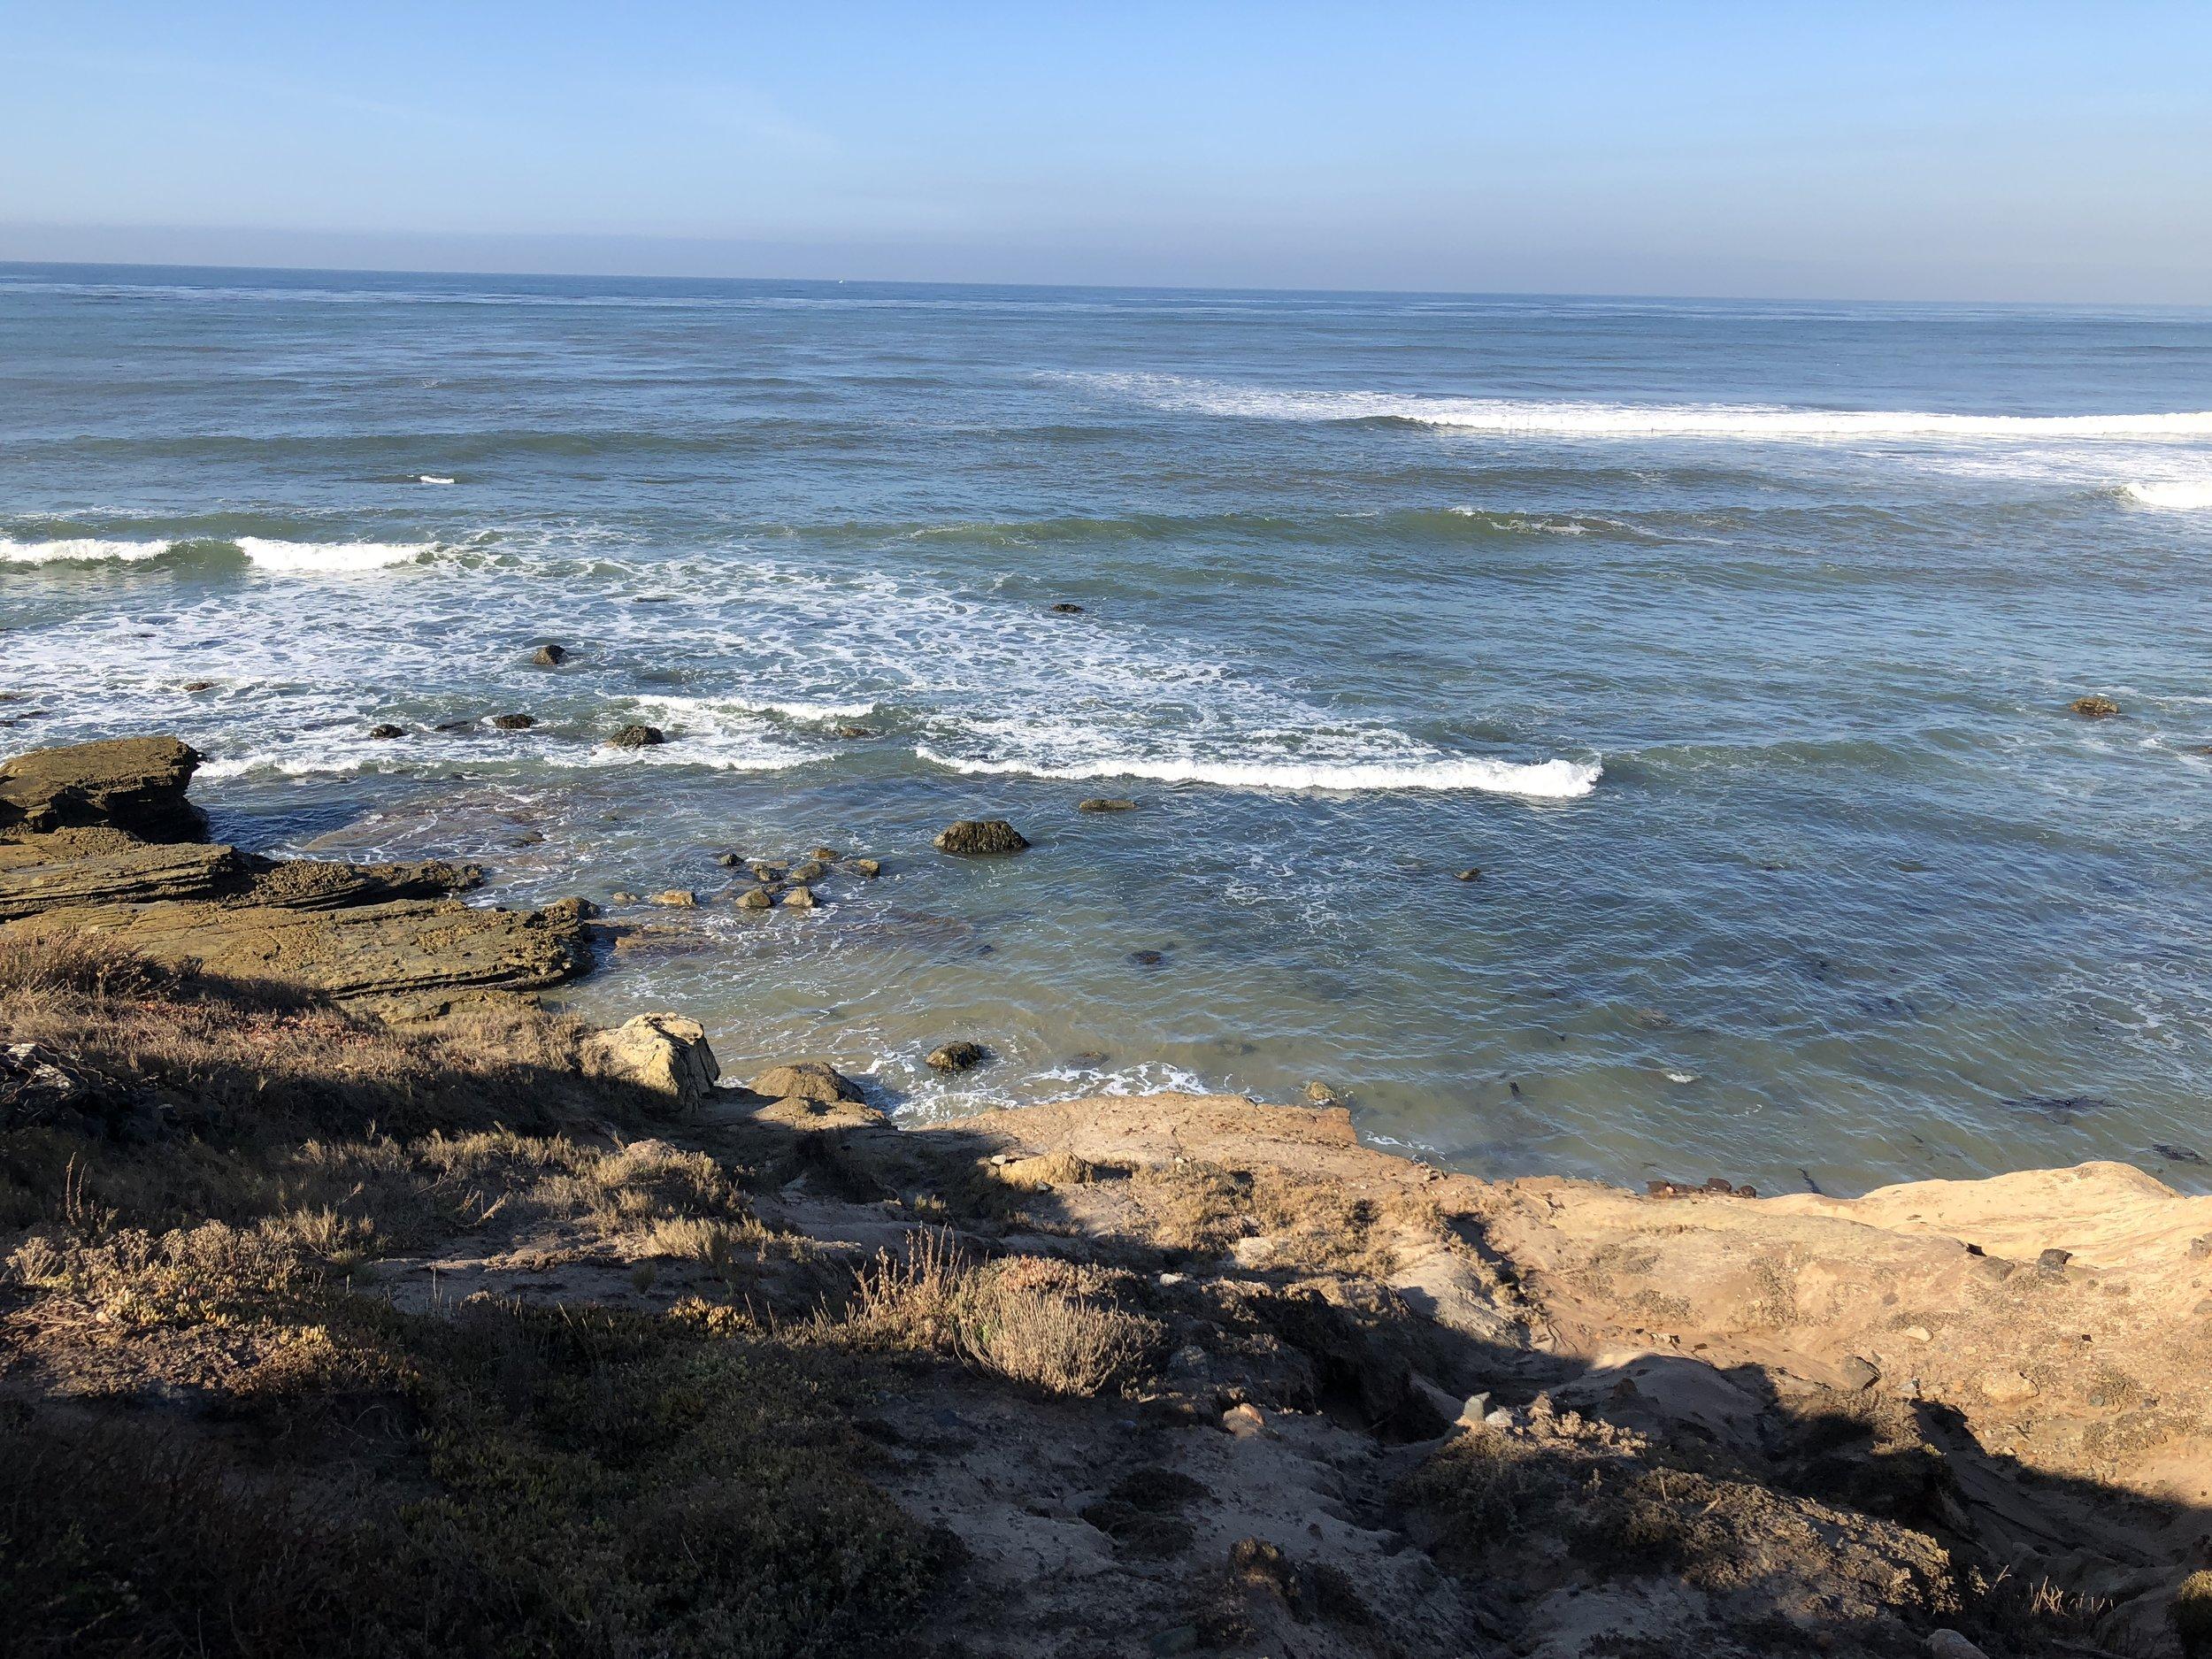 Point Loma tidepools